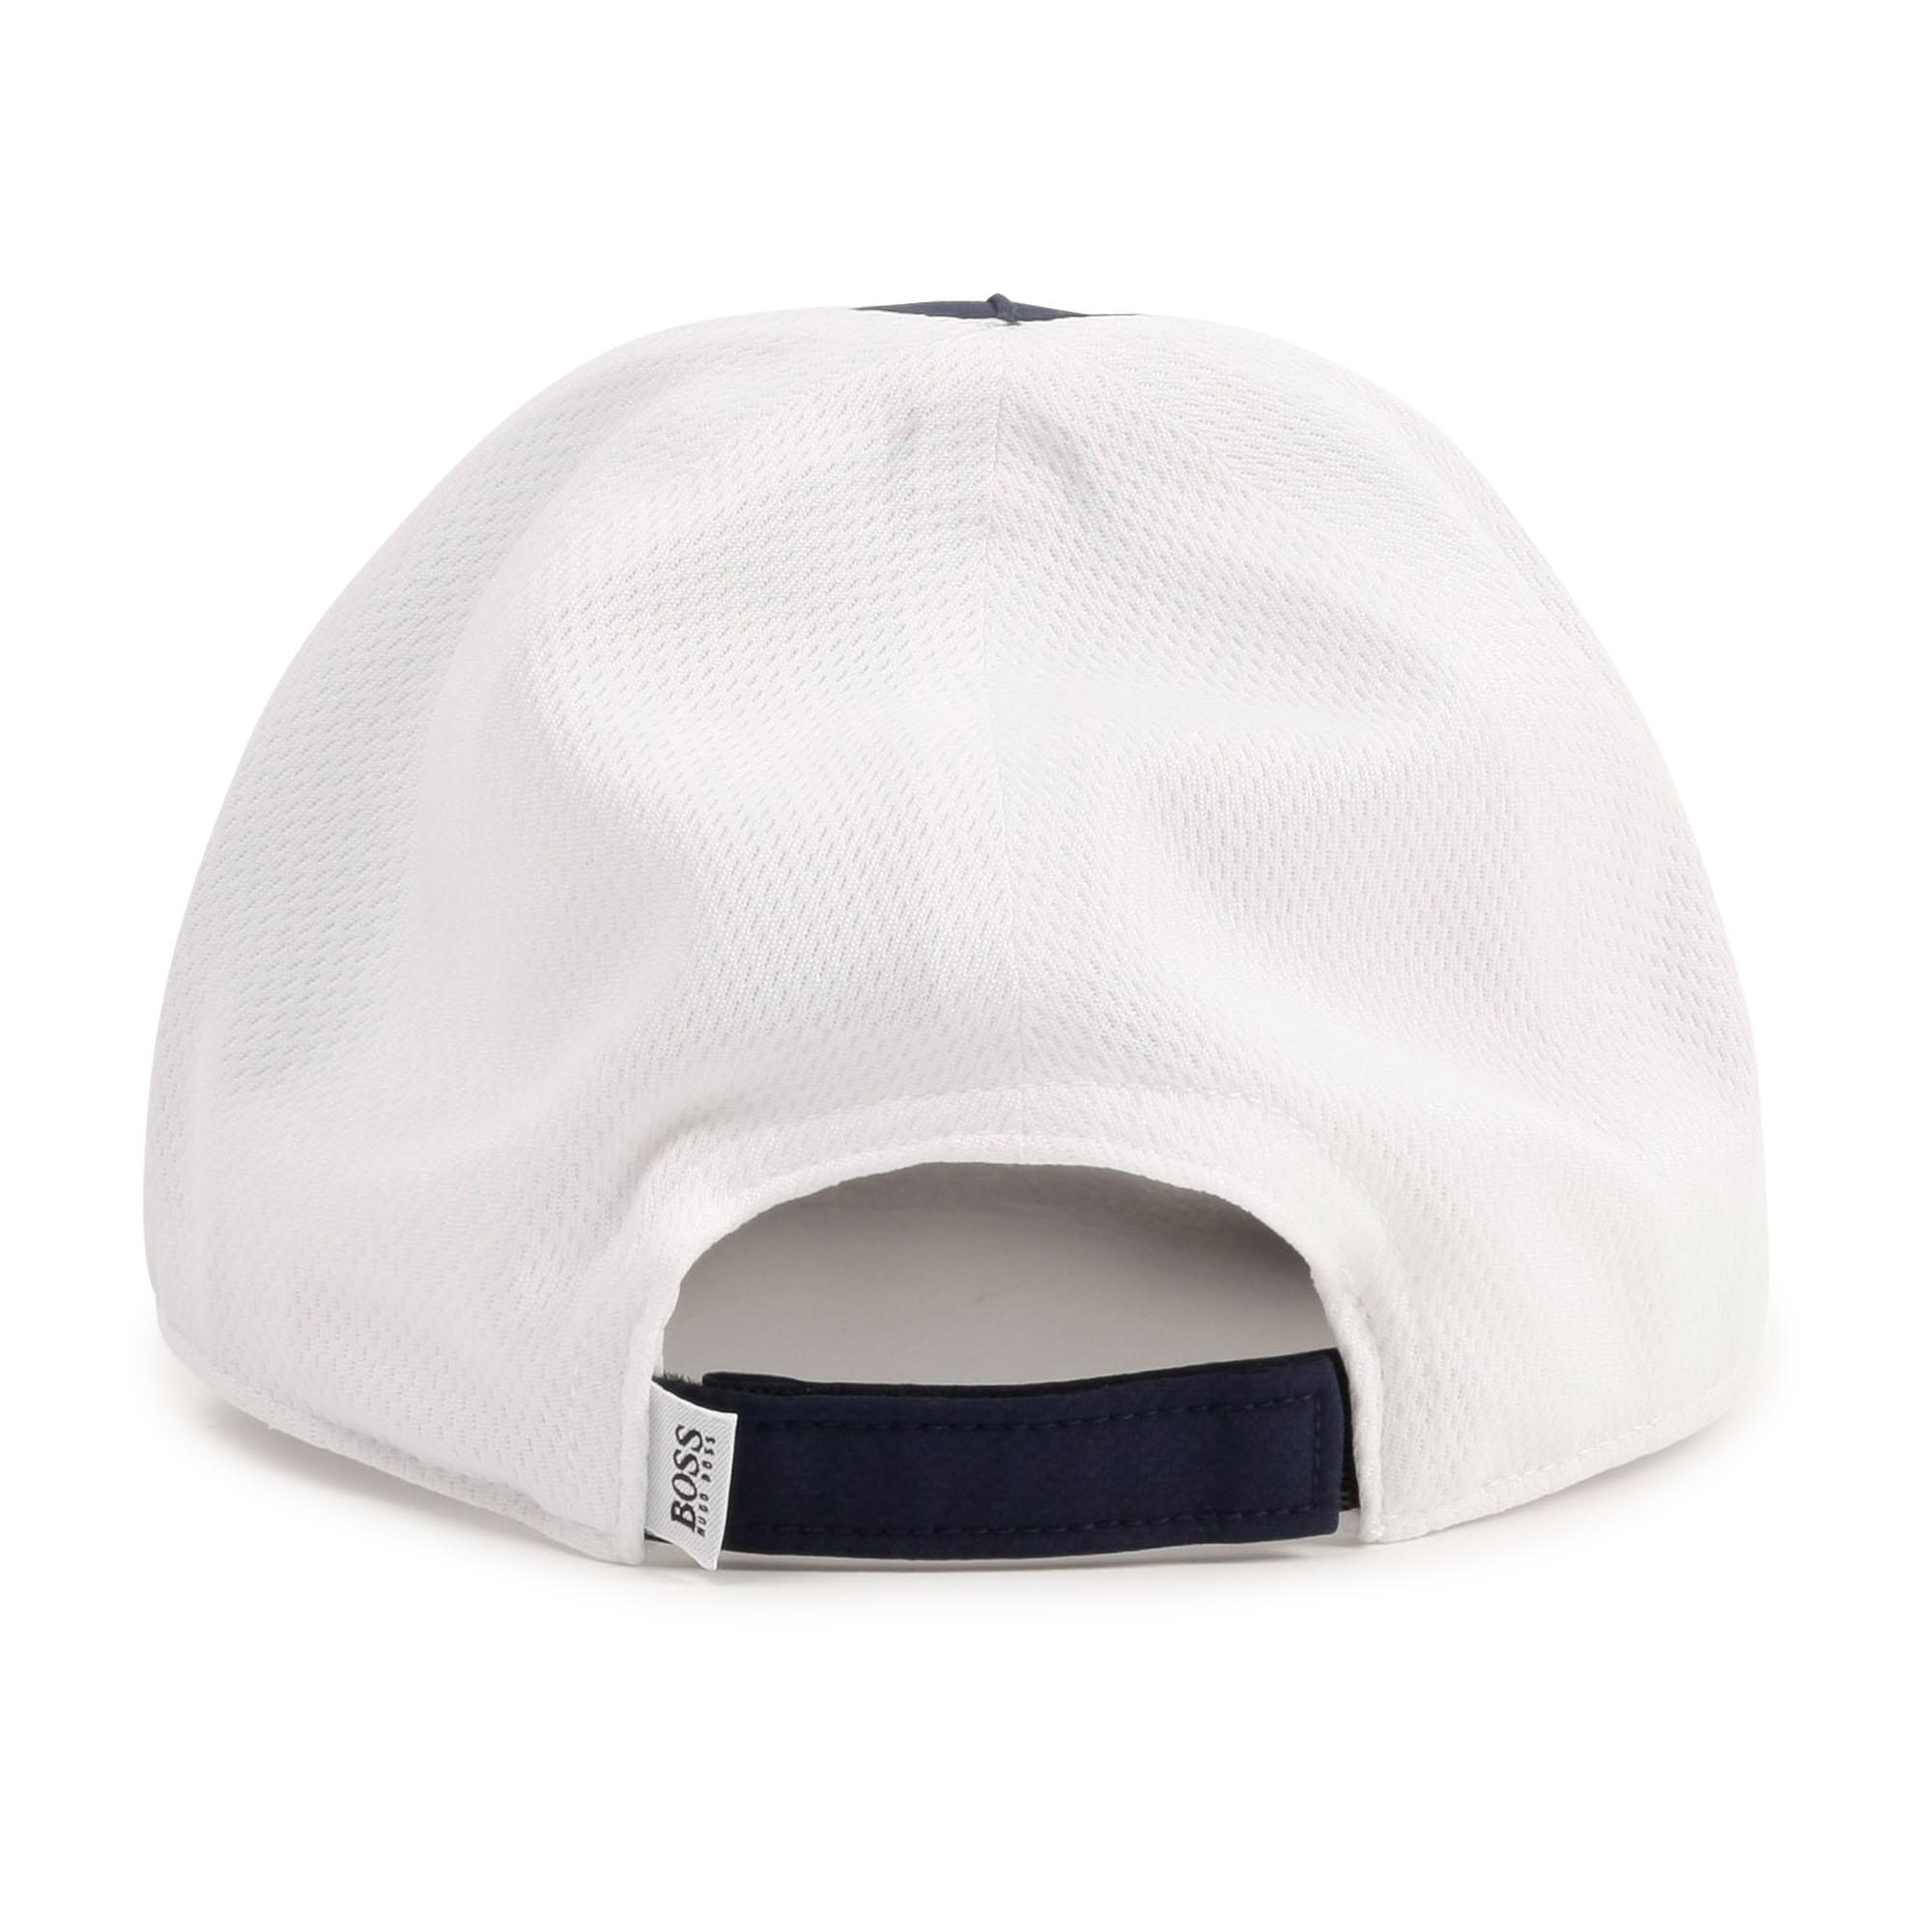 Two-tone logo cap BOSS for BOY